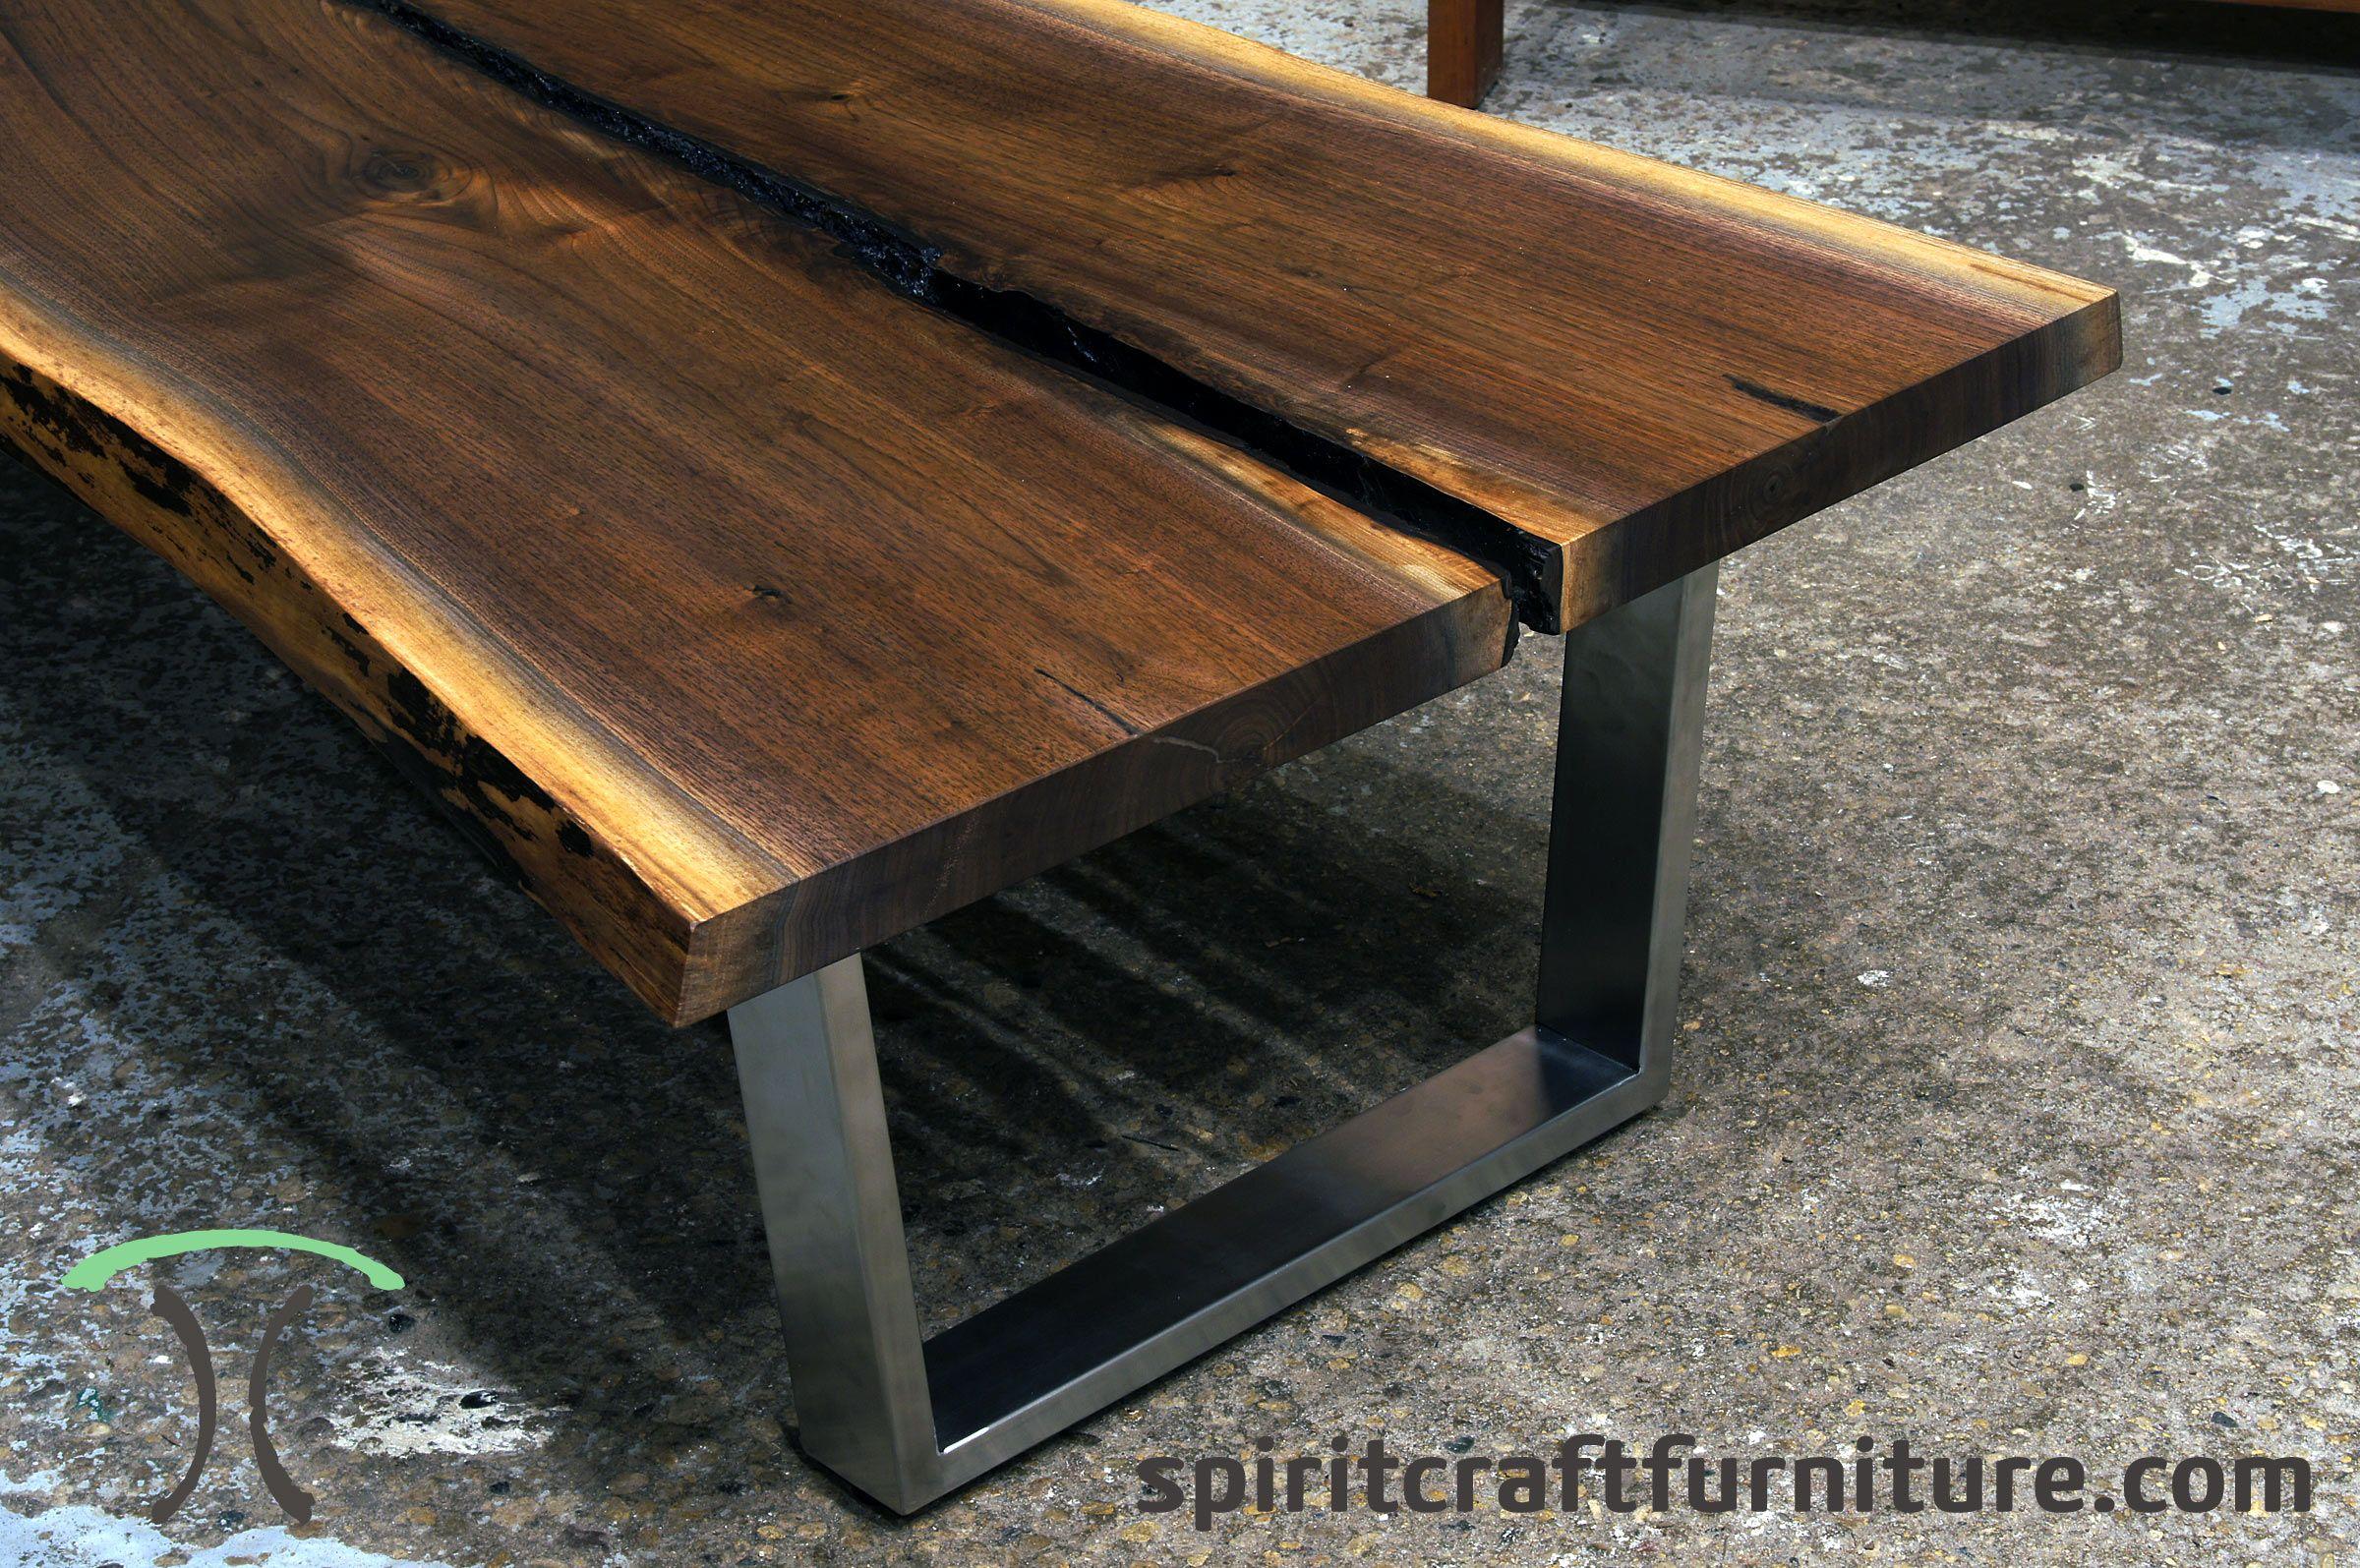 Black Walnut Live Edge Coffee Table on Stainless Steel ...